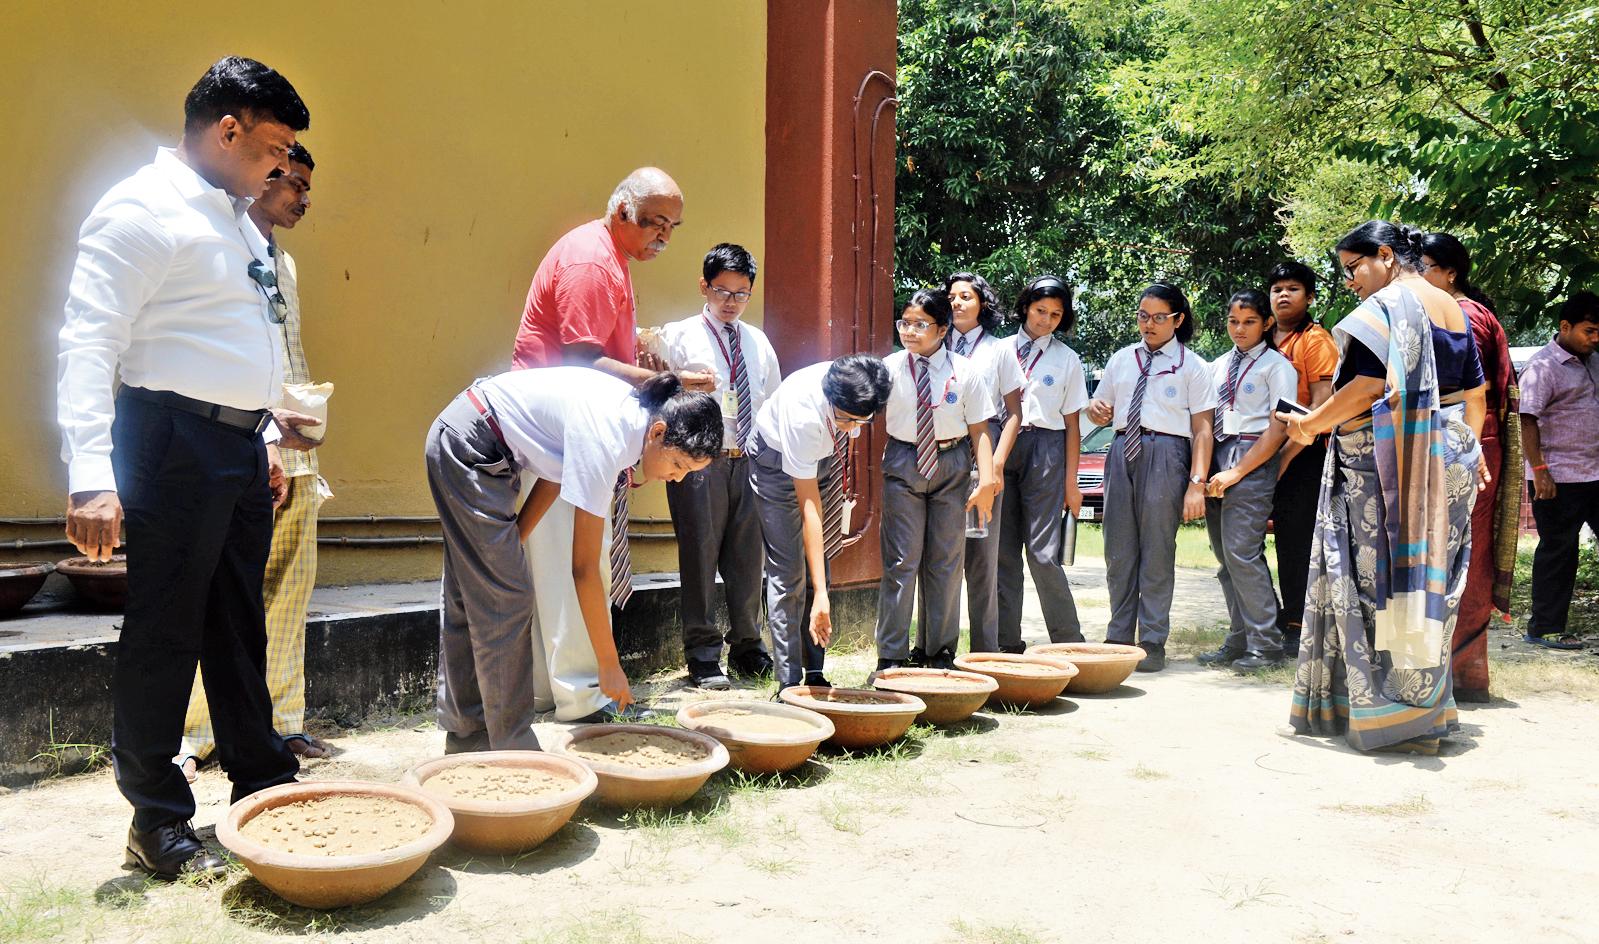 N Ramesh Chandran (in red) and students of Bharatiya Vidya Bhavan plant seeds of areca palm at the school's Salt Lake campus on Monday.